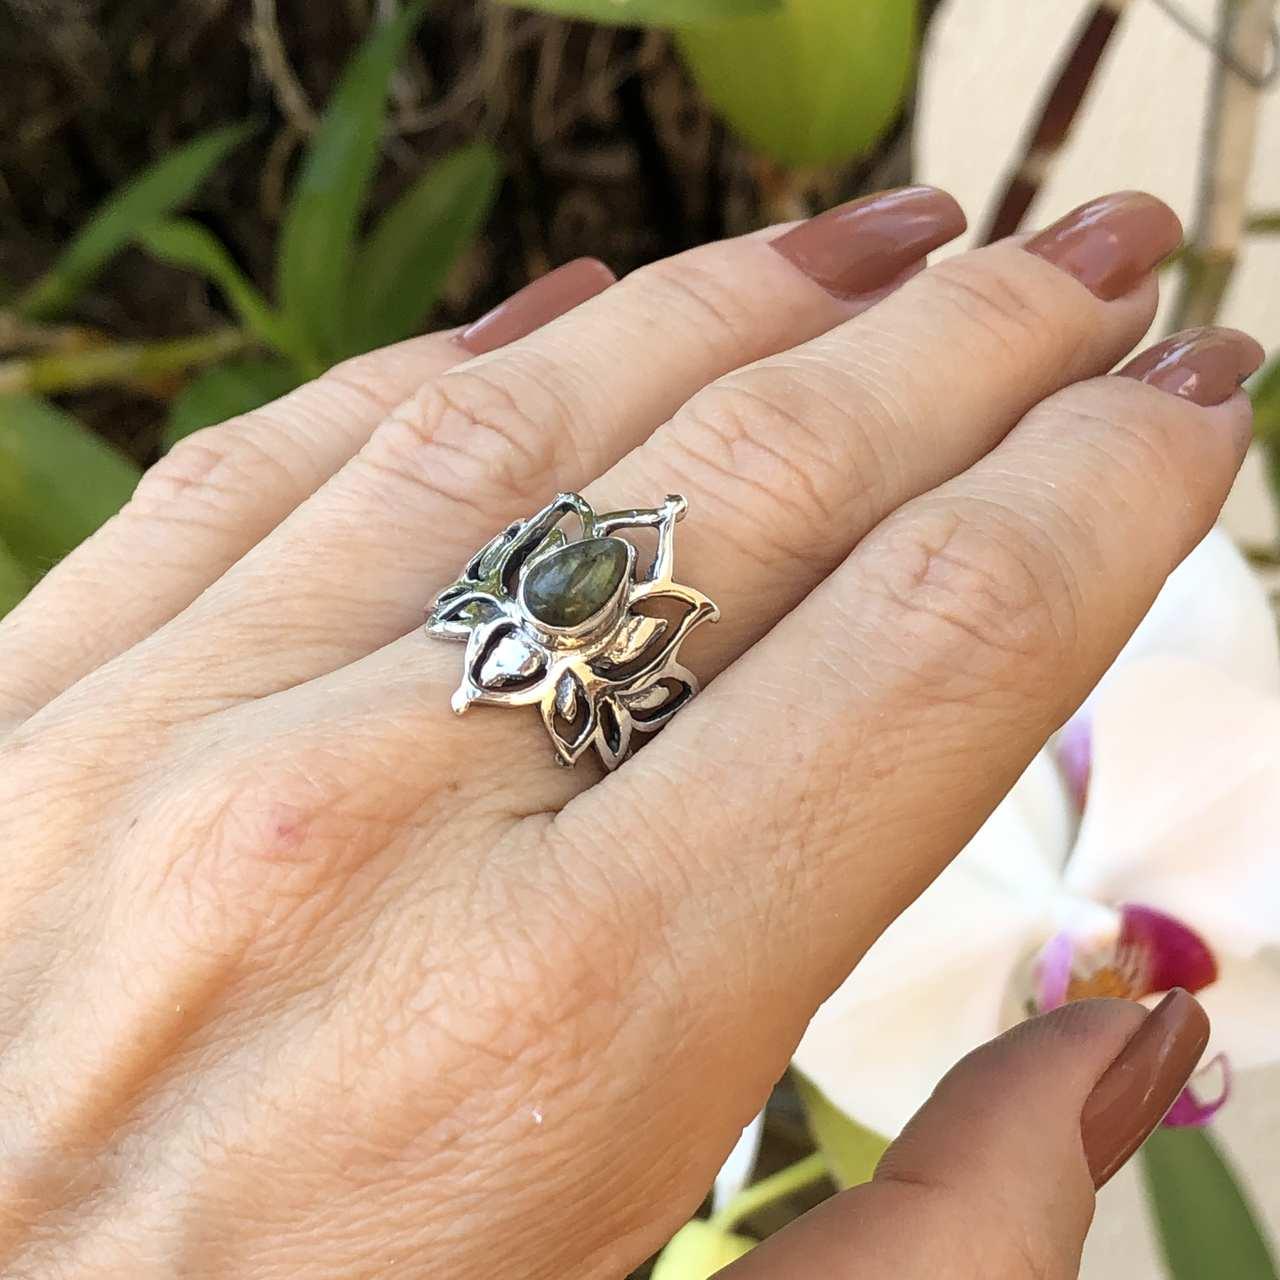 Anel de Prata 925 Flor de Lótus Pedra Labradorita